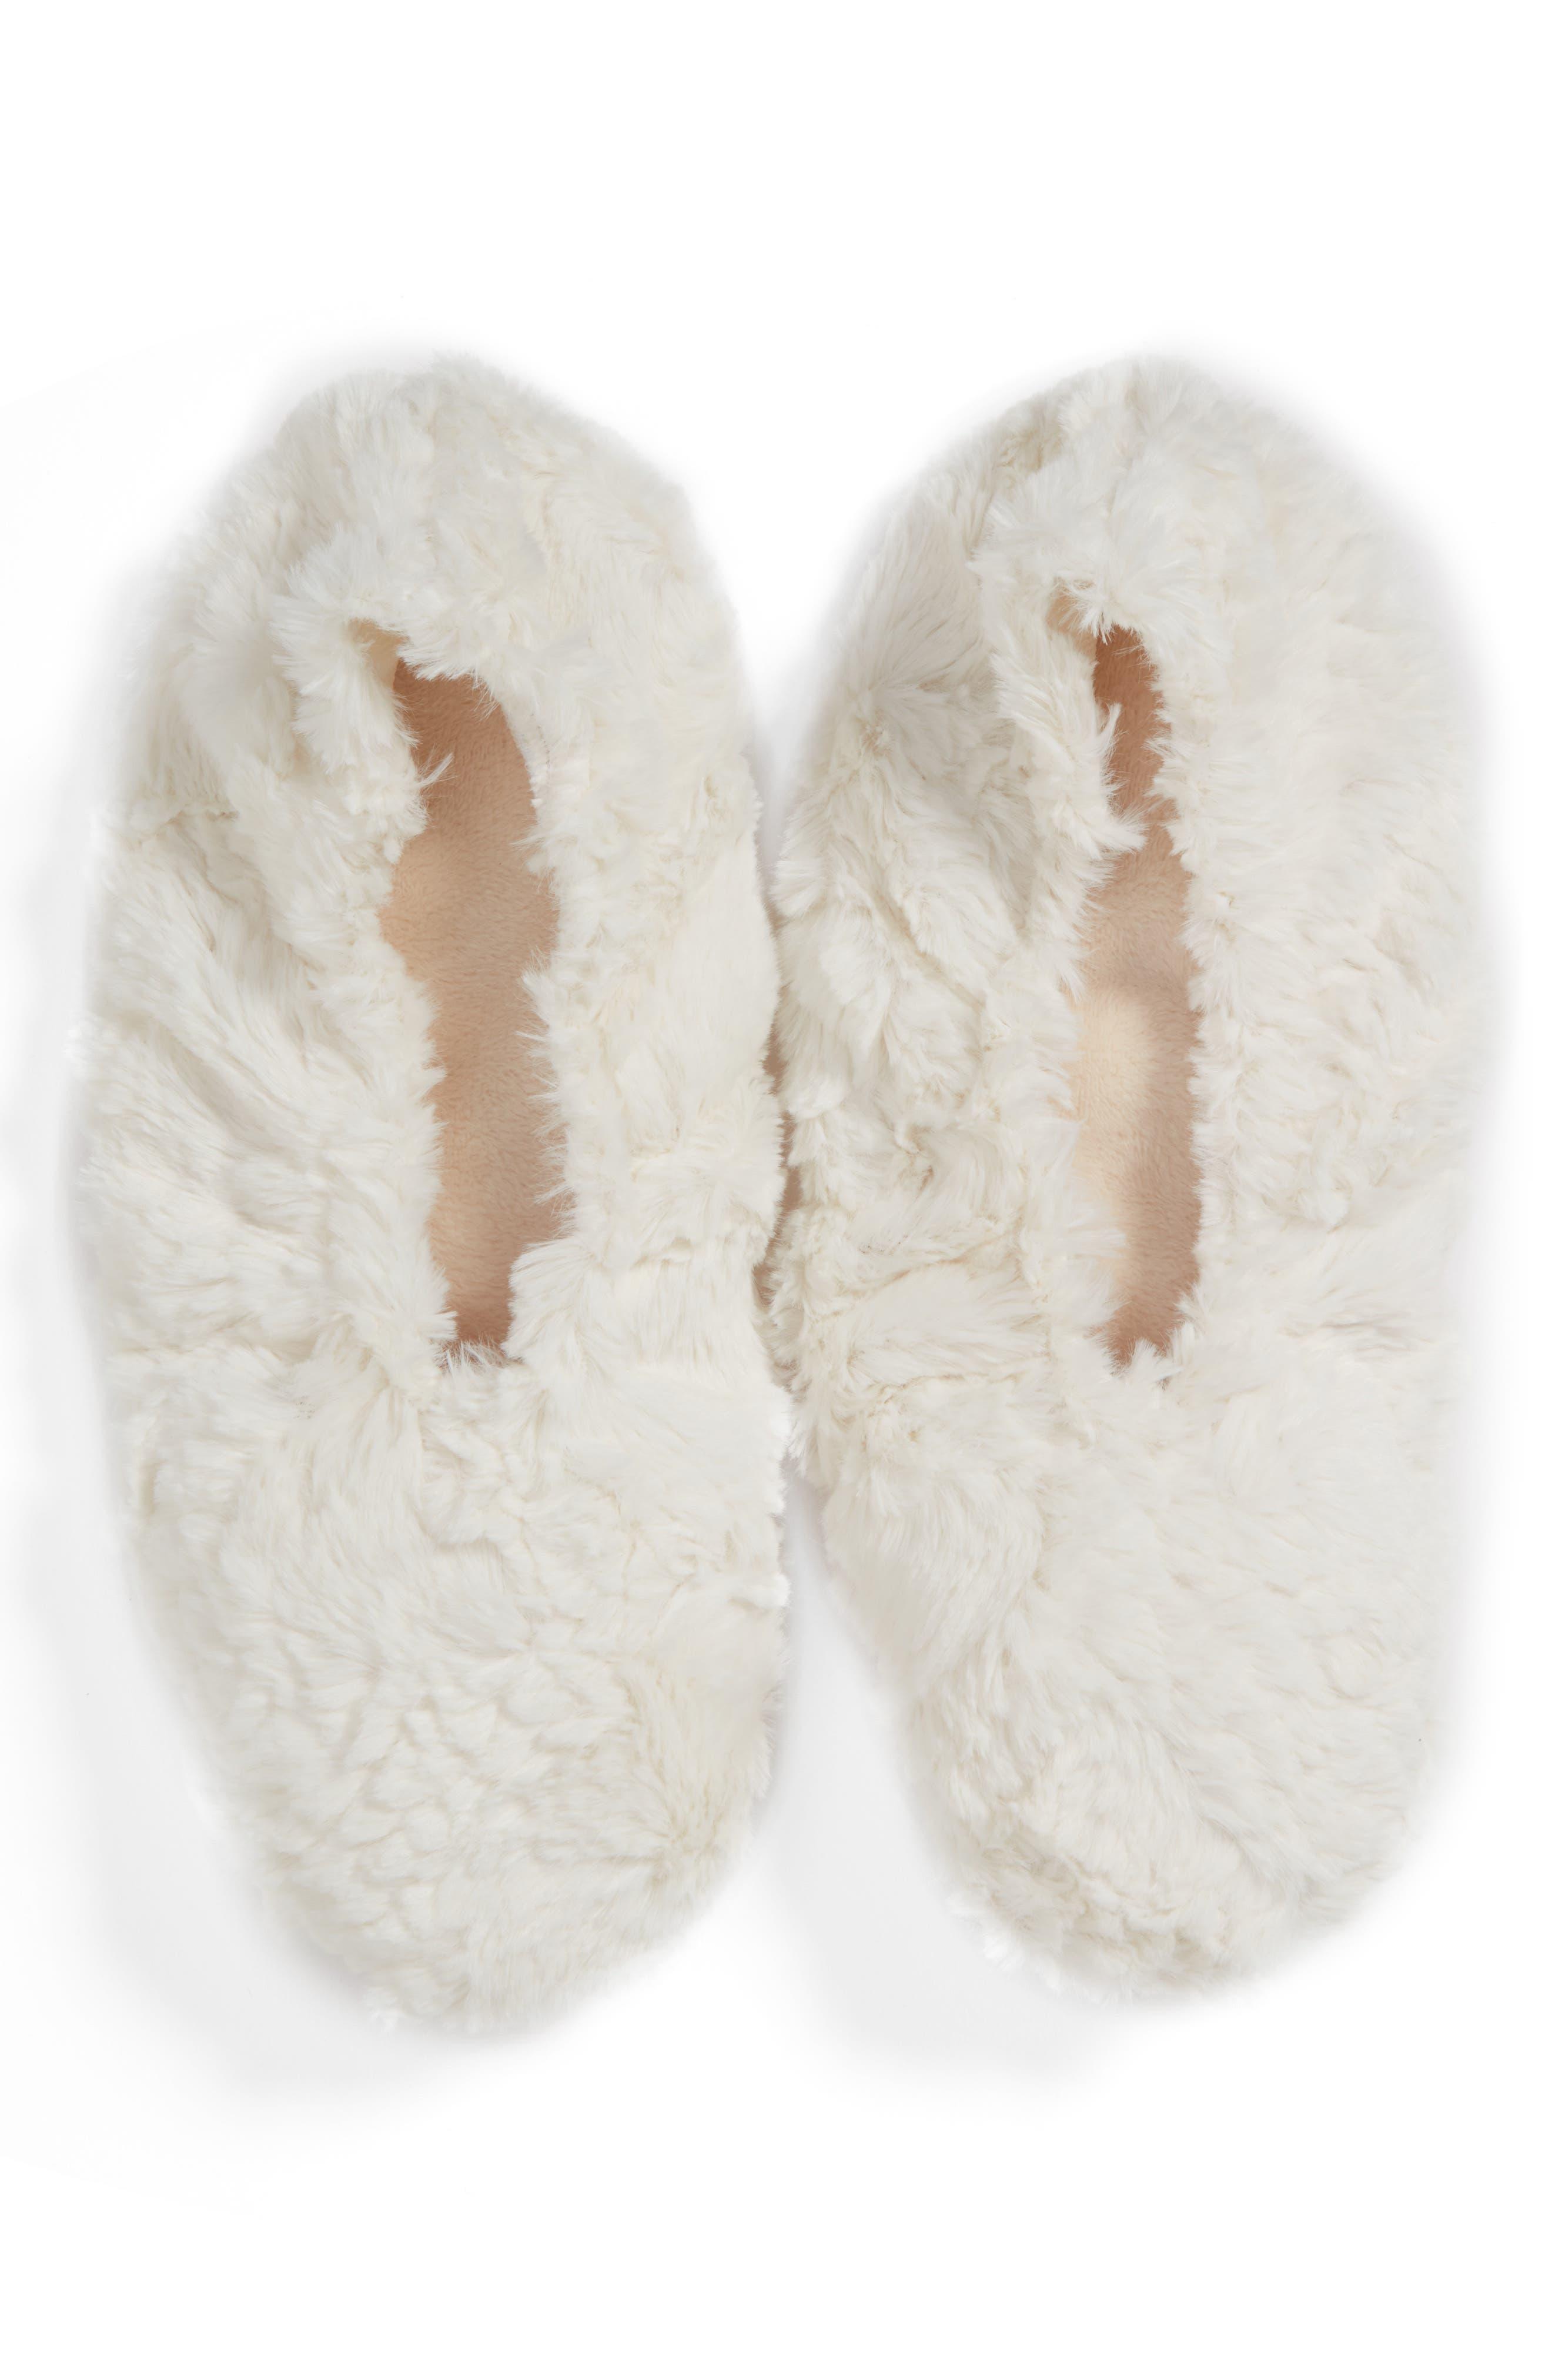 Sonoma Lavender Footies